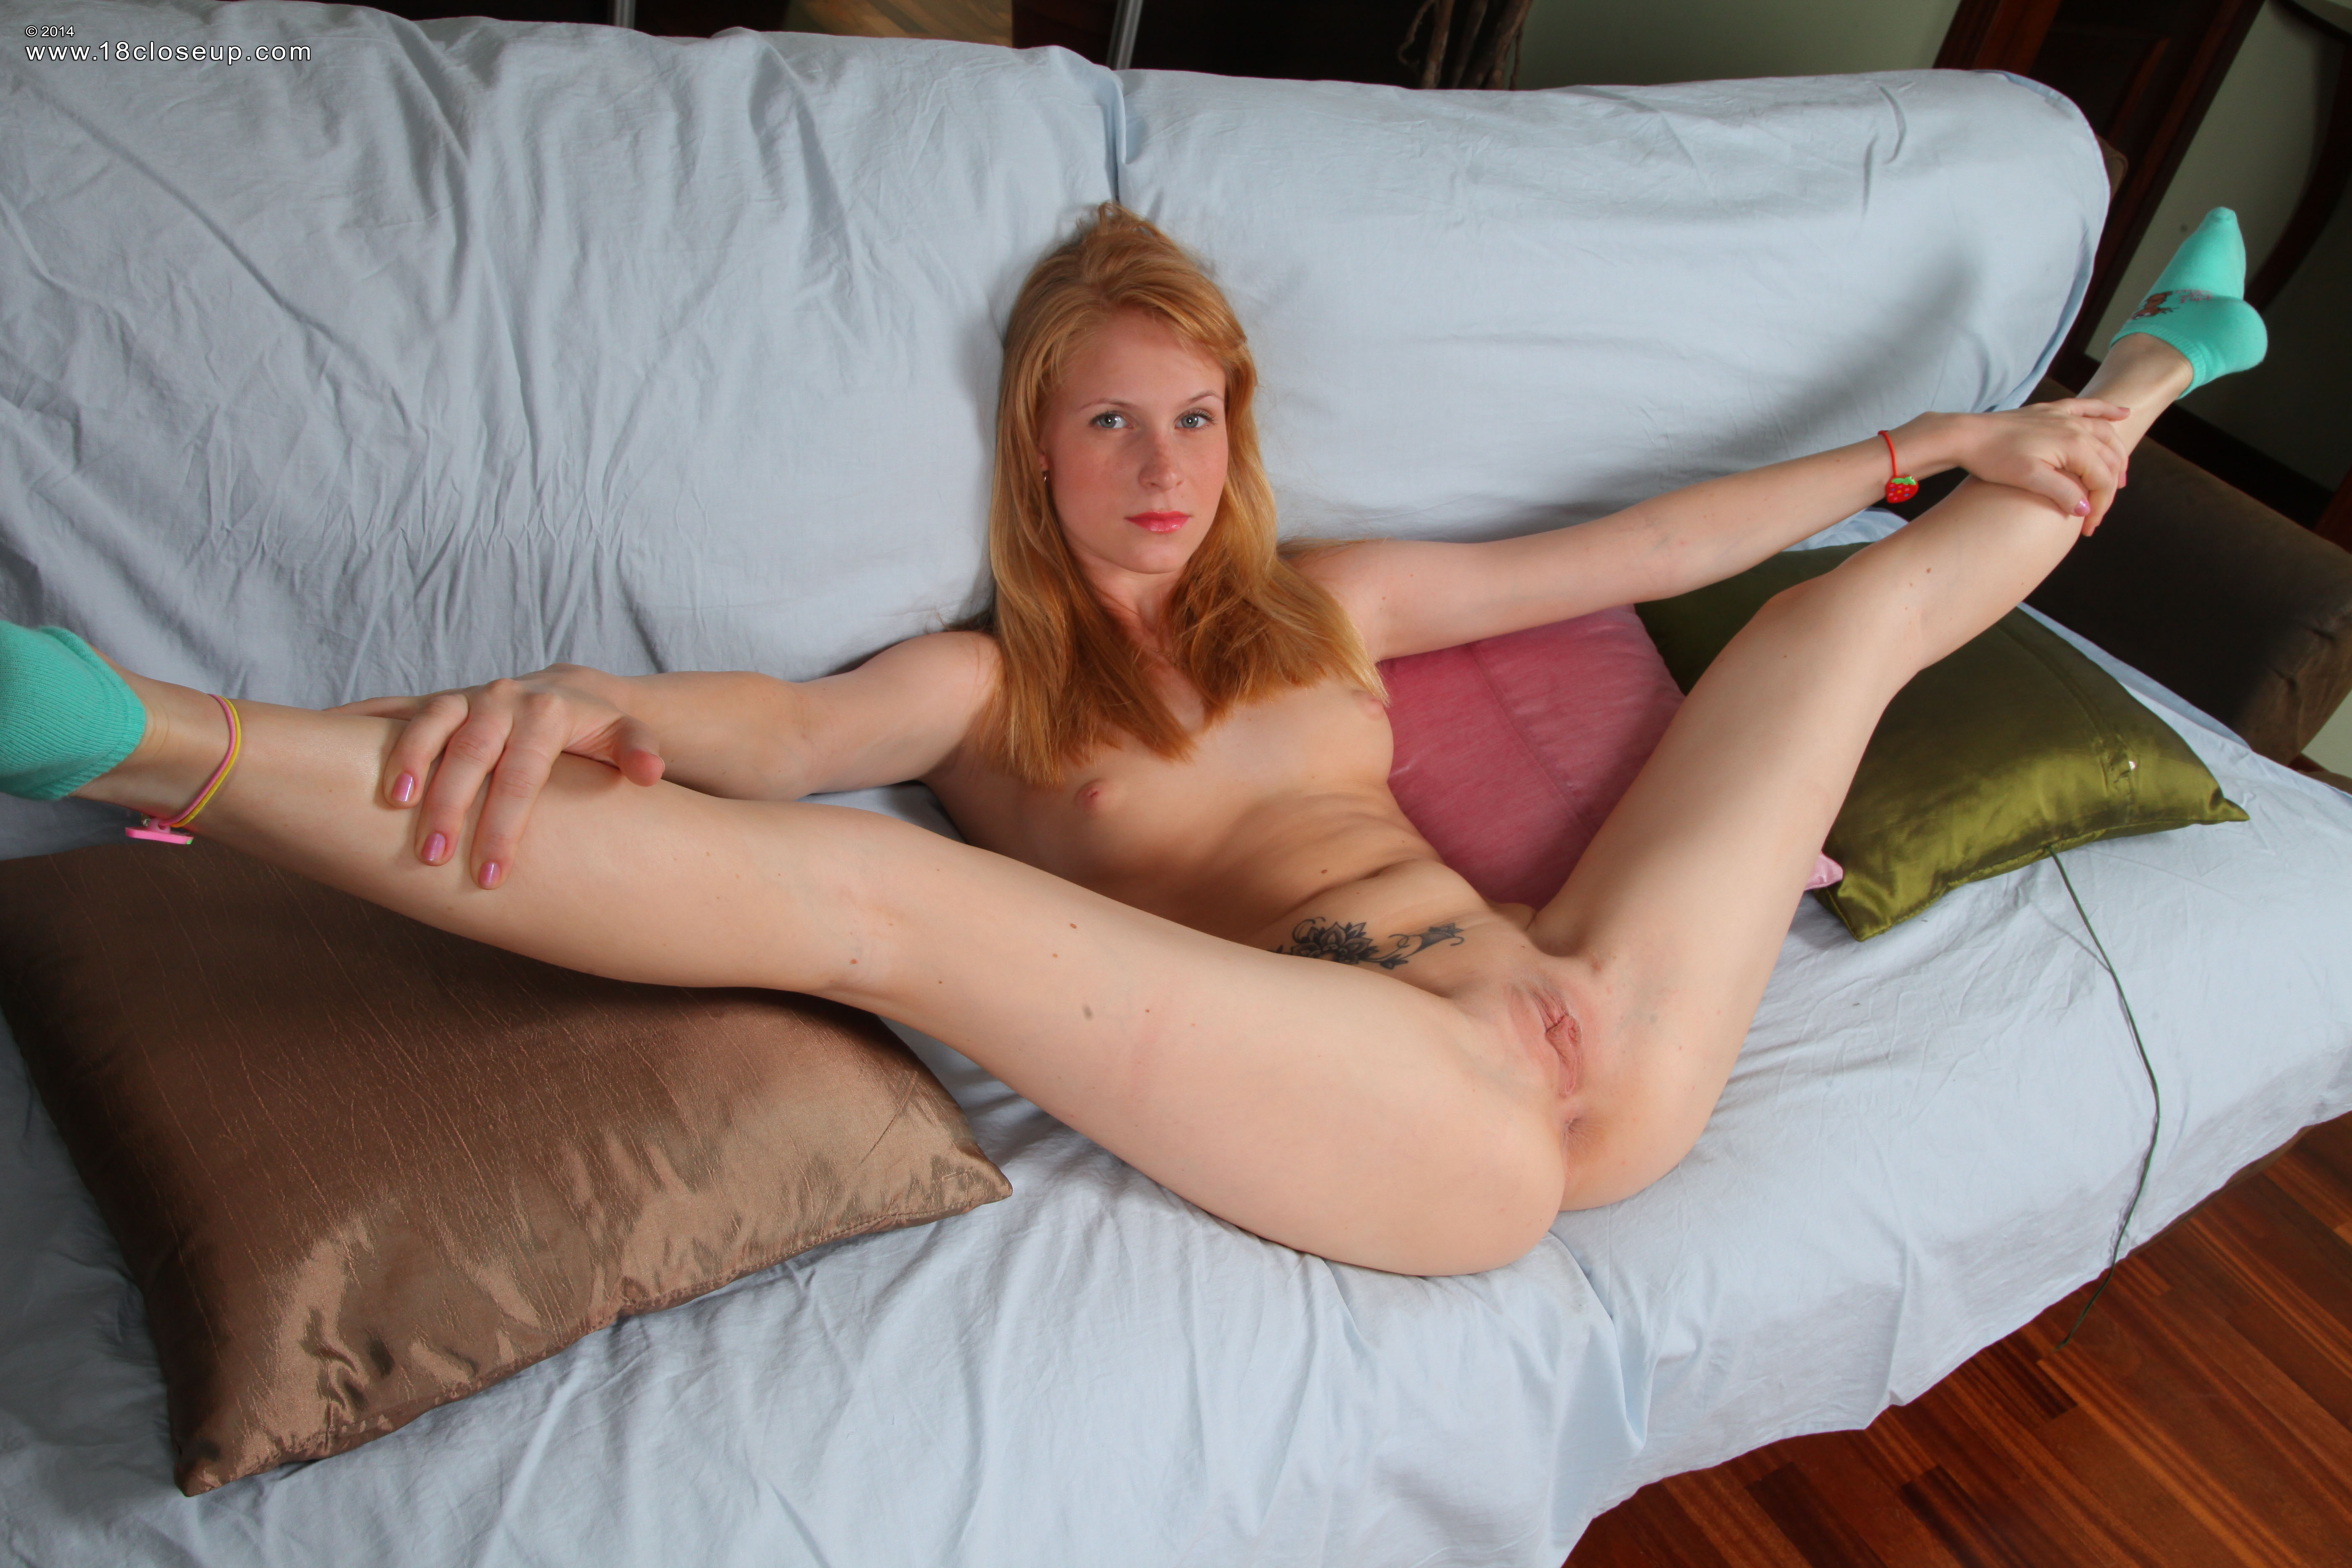 spanish sexy girl facking